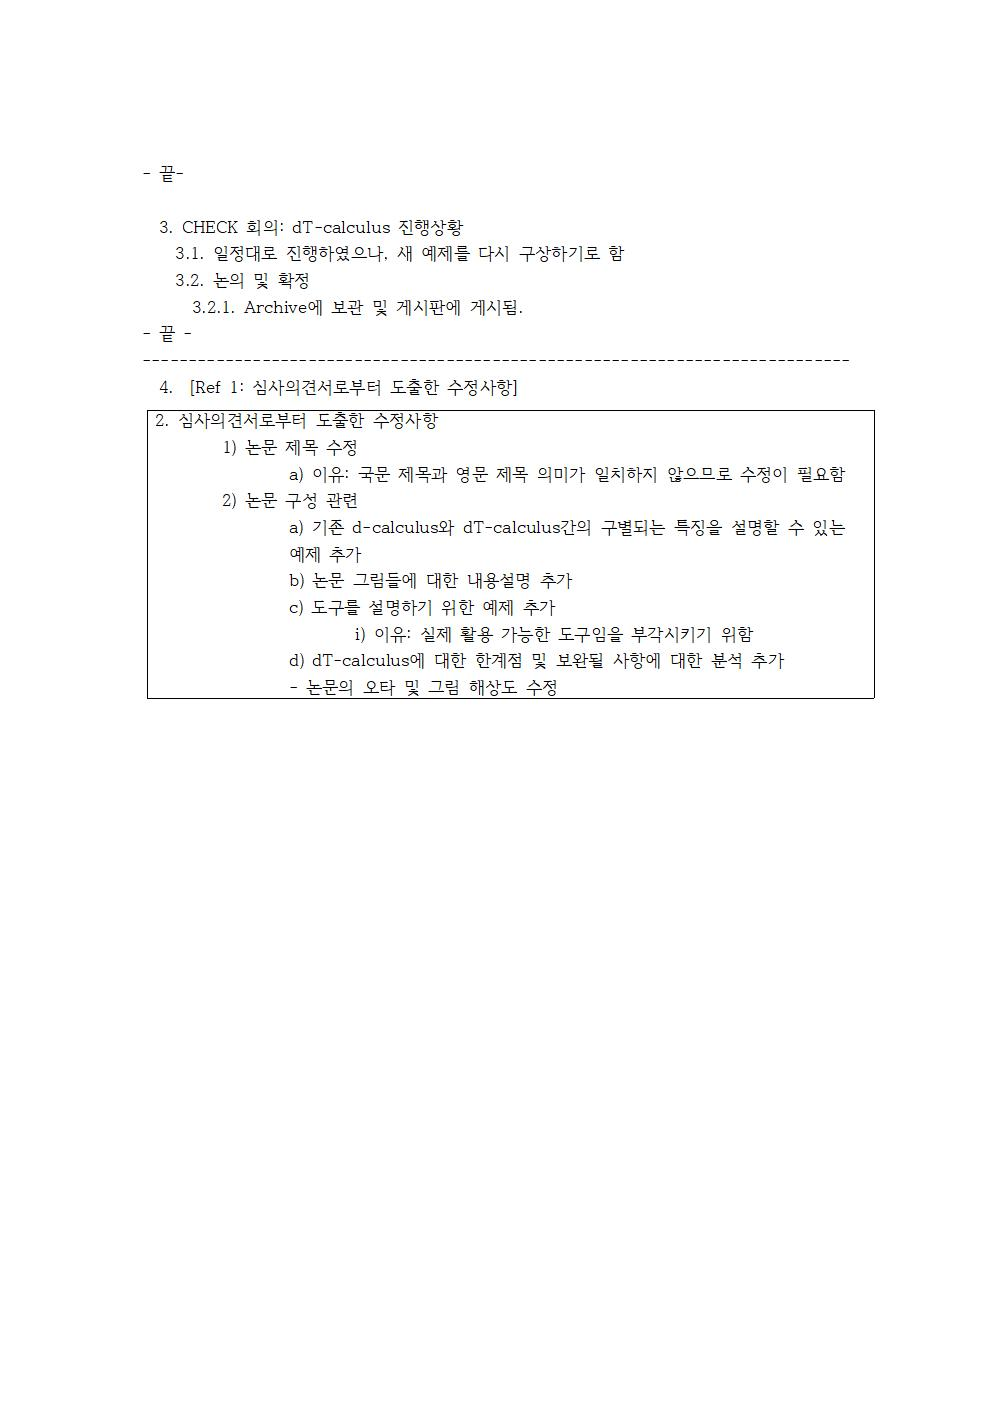 D-[17-084-PP-13]-[KIISE2017-dT-calculus]-[SH]-[2017-11-04]002.jpg